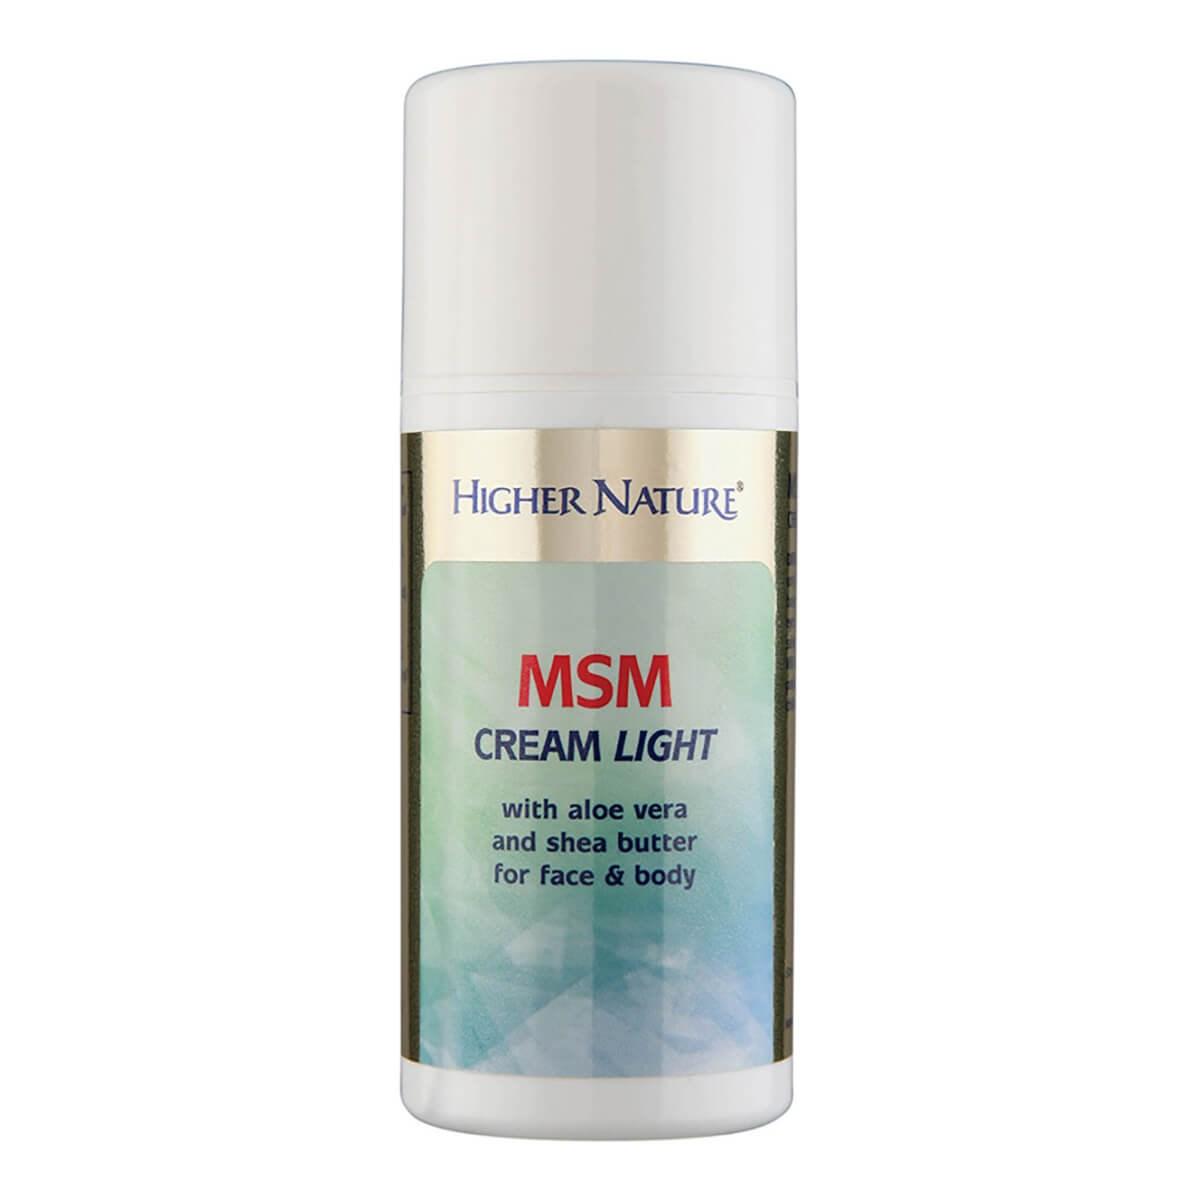 Higher Nature MSM Cream Light